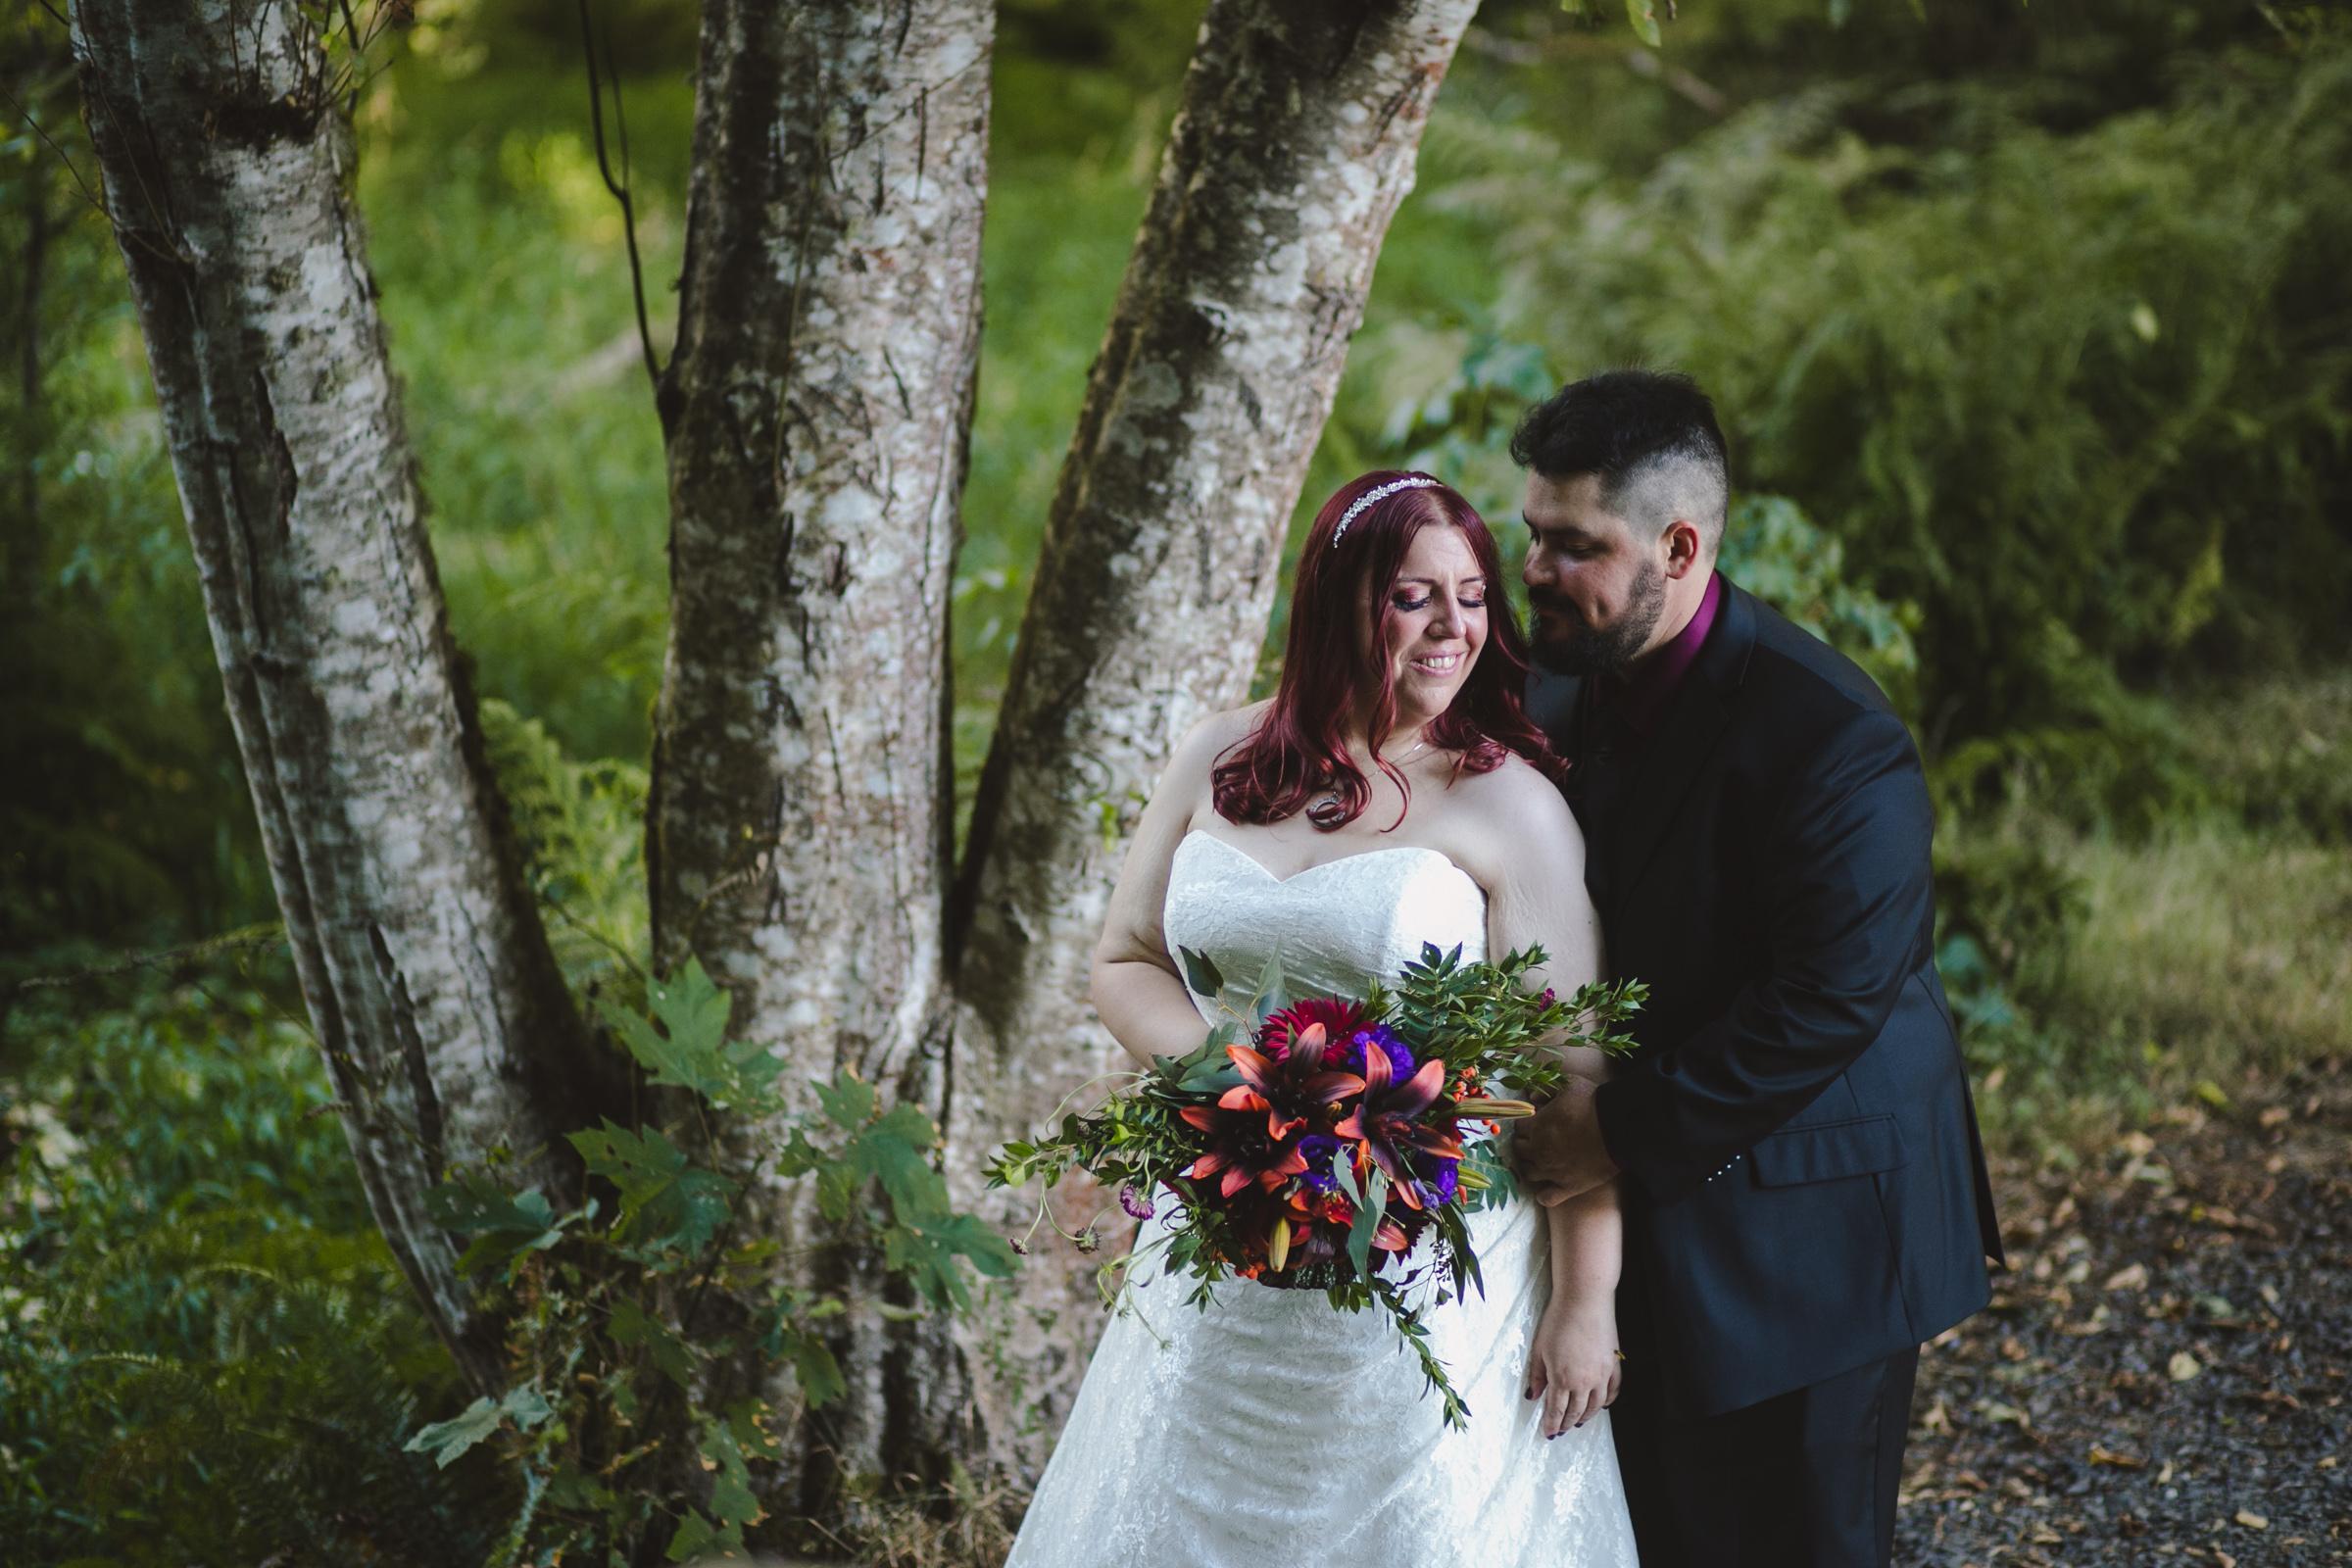 jo+jacob_wedding_favorites-28